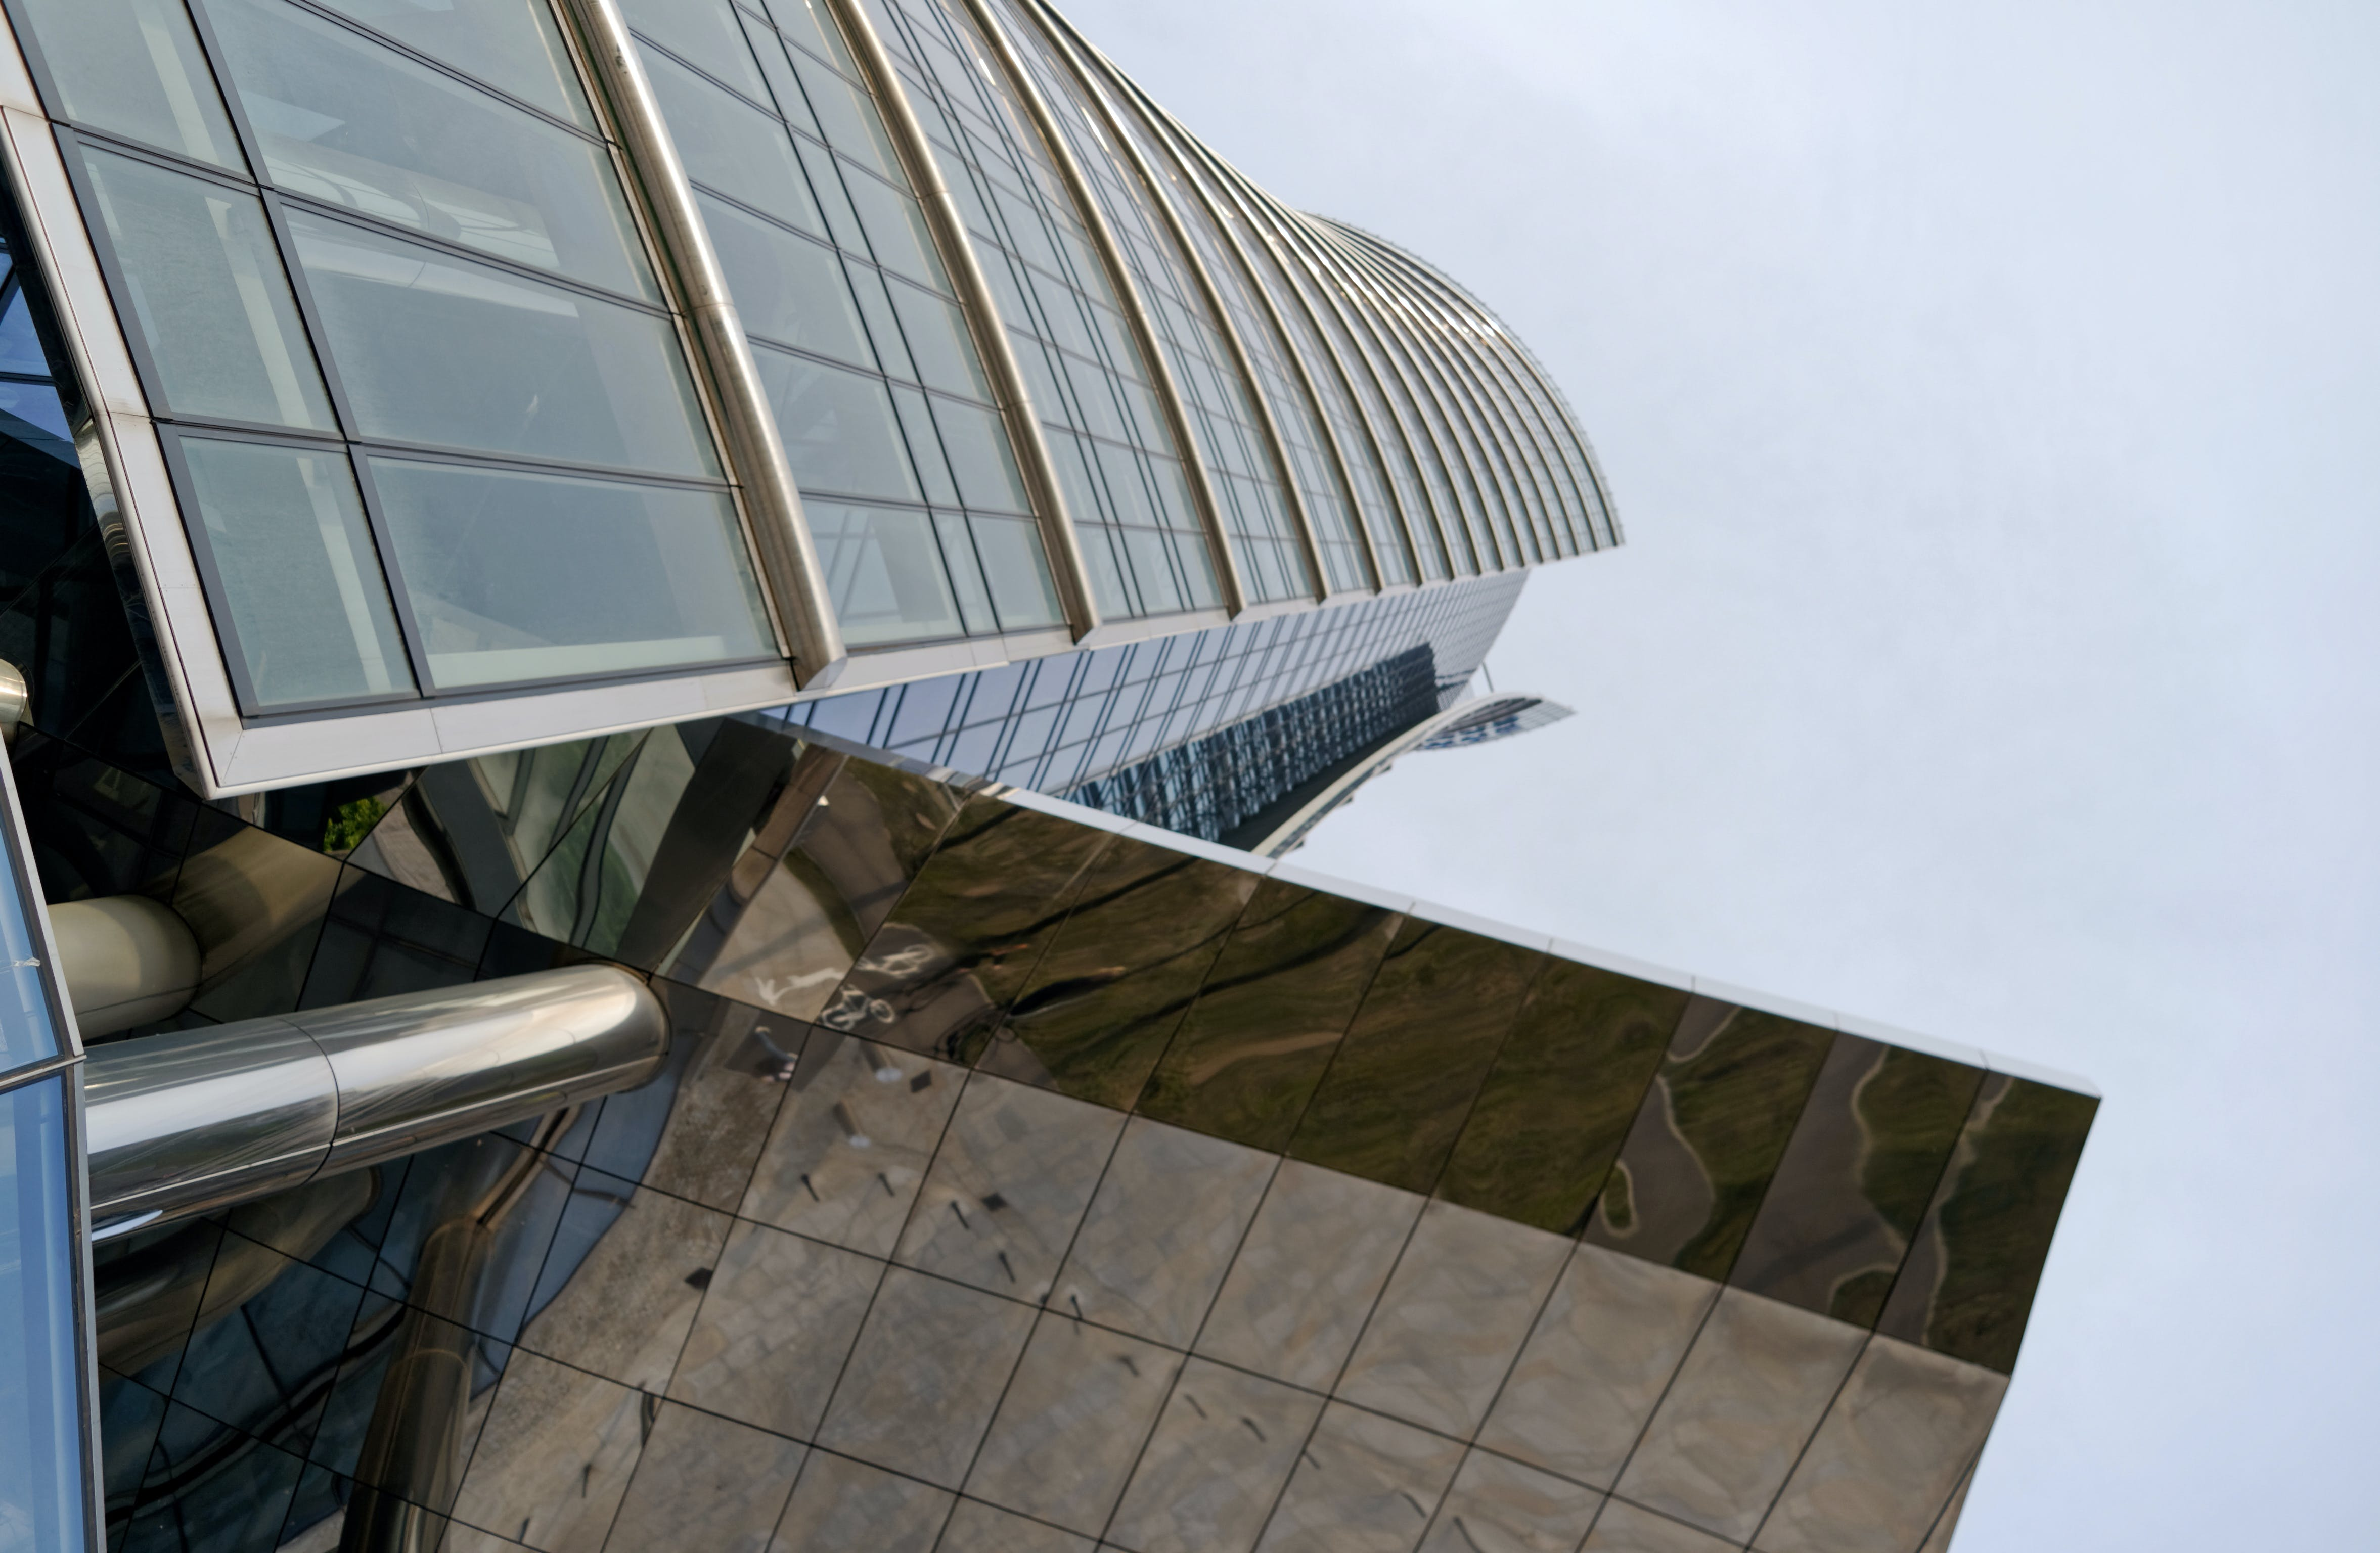 Gratis arkivbilde med betong, by, bygning, futuristisk